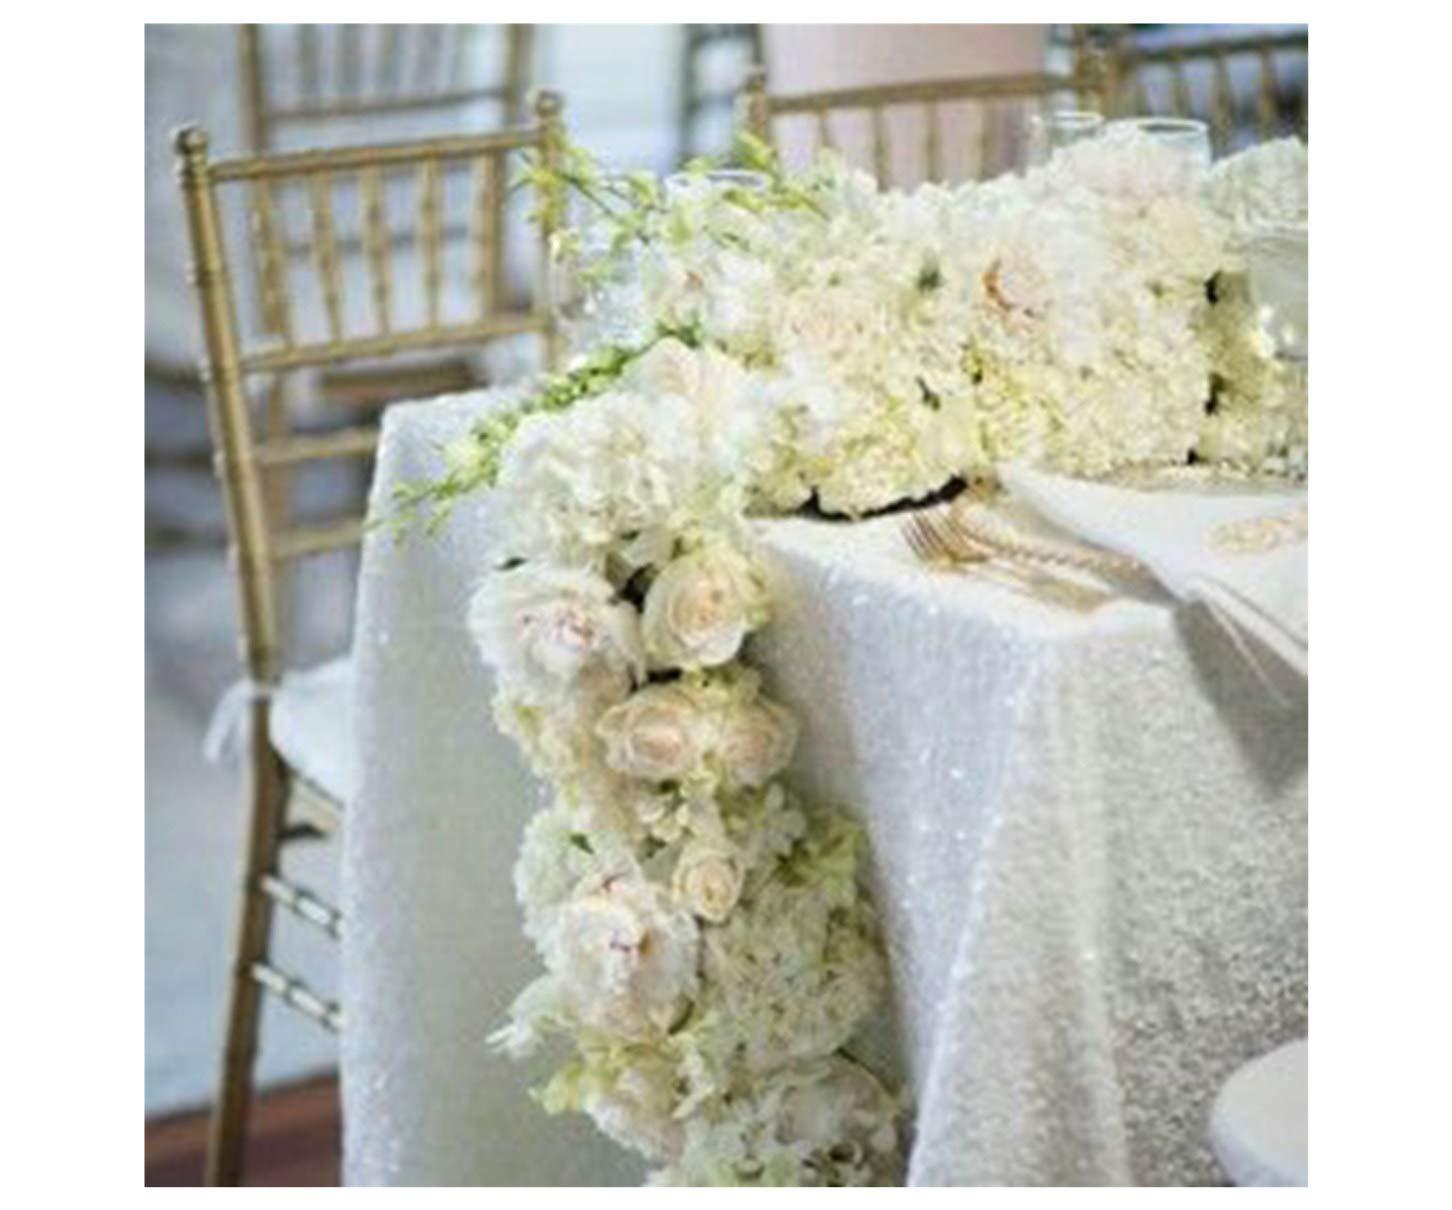 ShiDianYi 90 x 132-inch -長方形スパンコールウェディング/パーティー/イベント/Chrismasの装飾tablecloth- 90x132-Inch 14193413  ホワイト B06XRWK68C